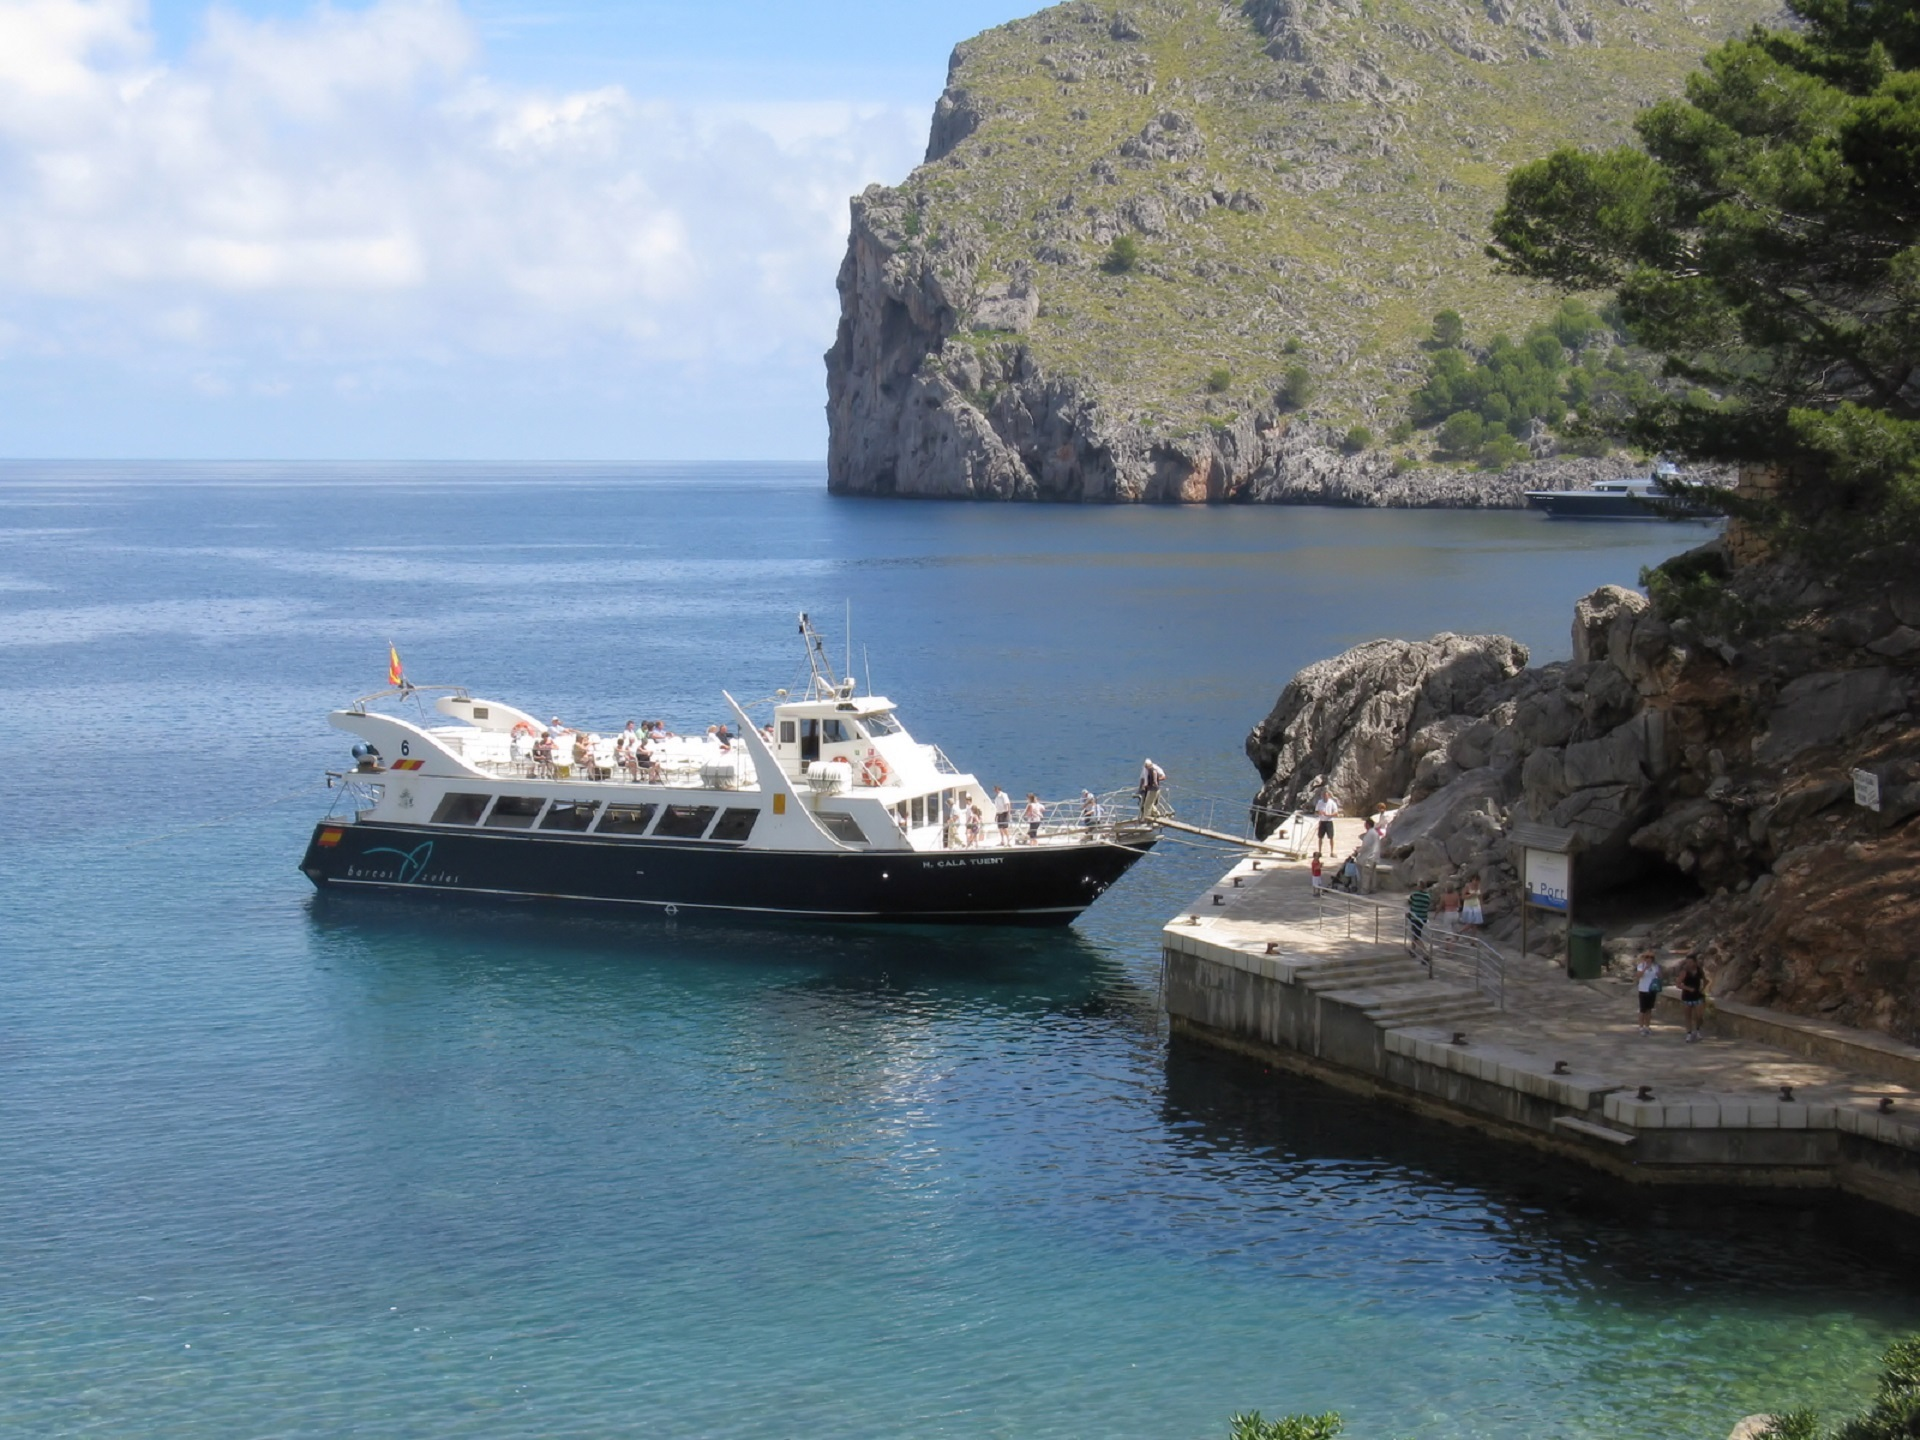 Tourist boat photo